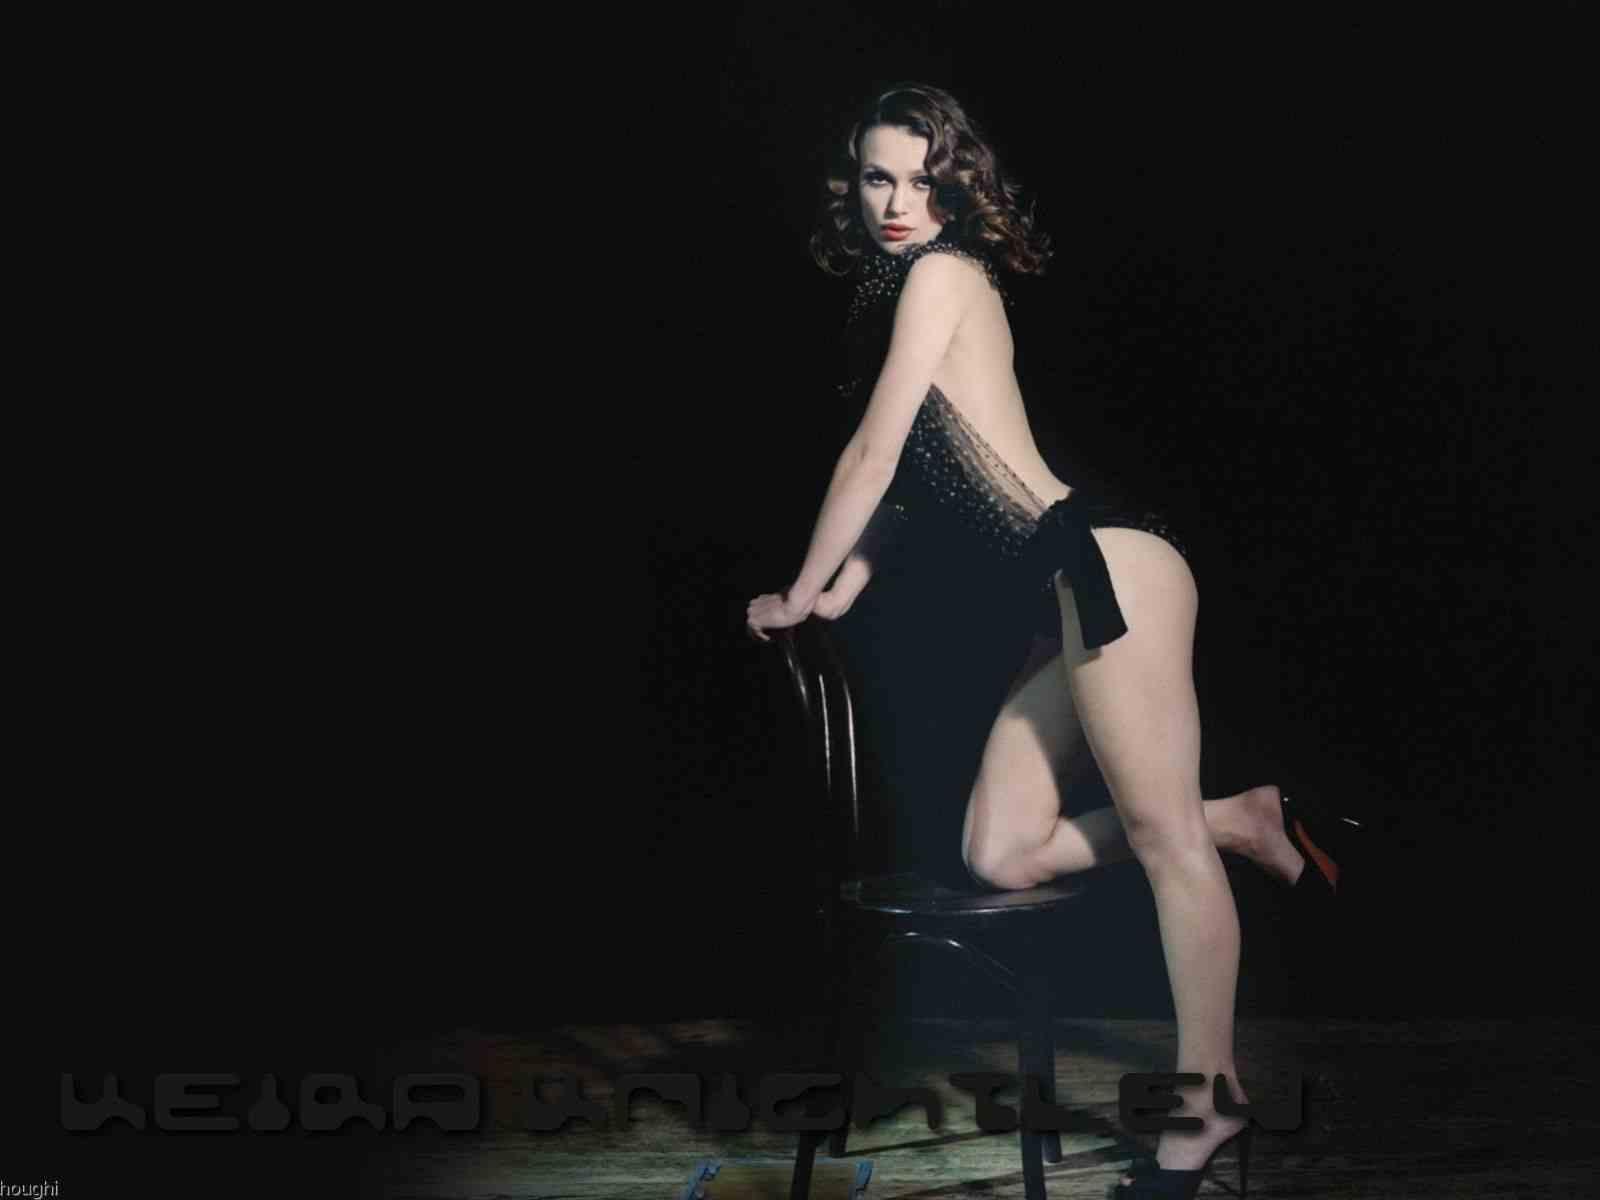 Sliding her panties off